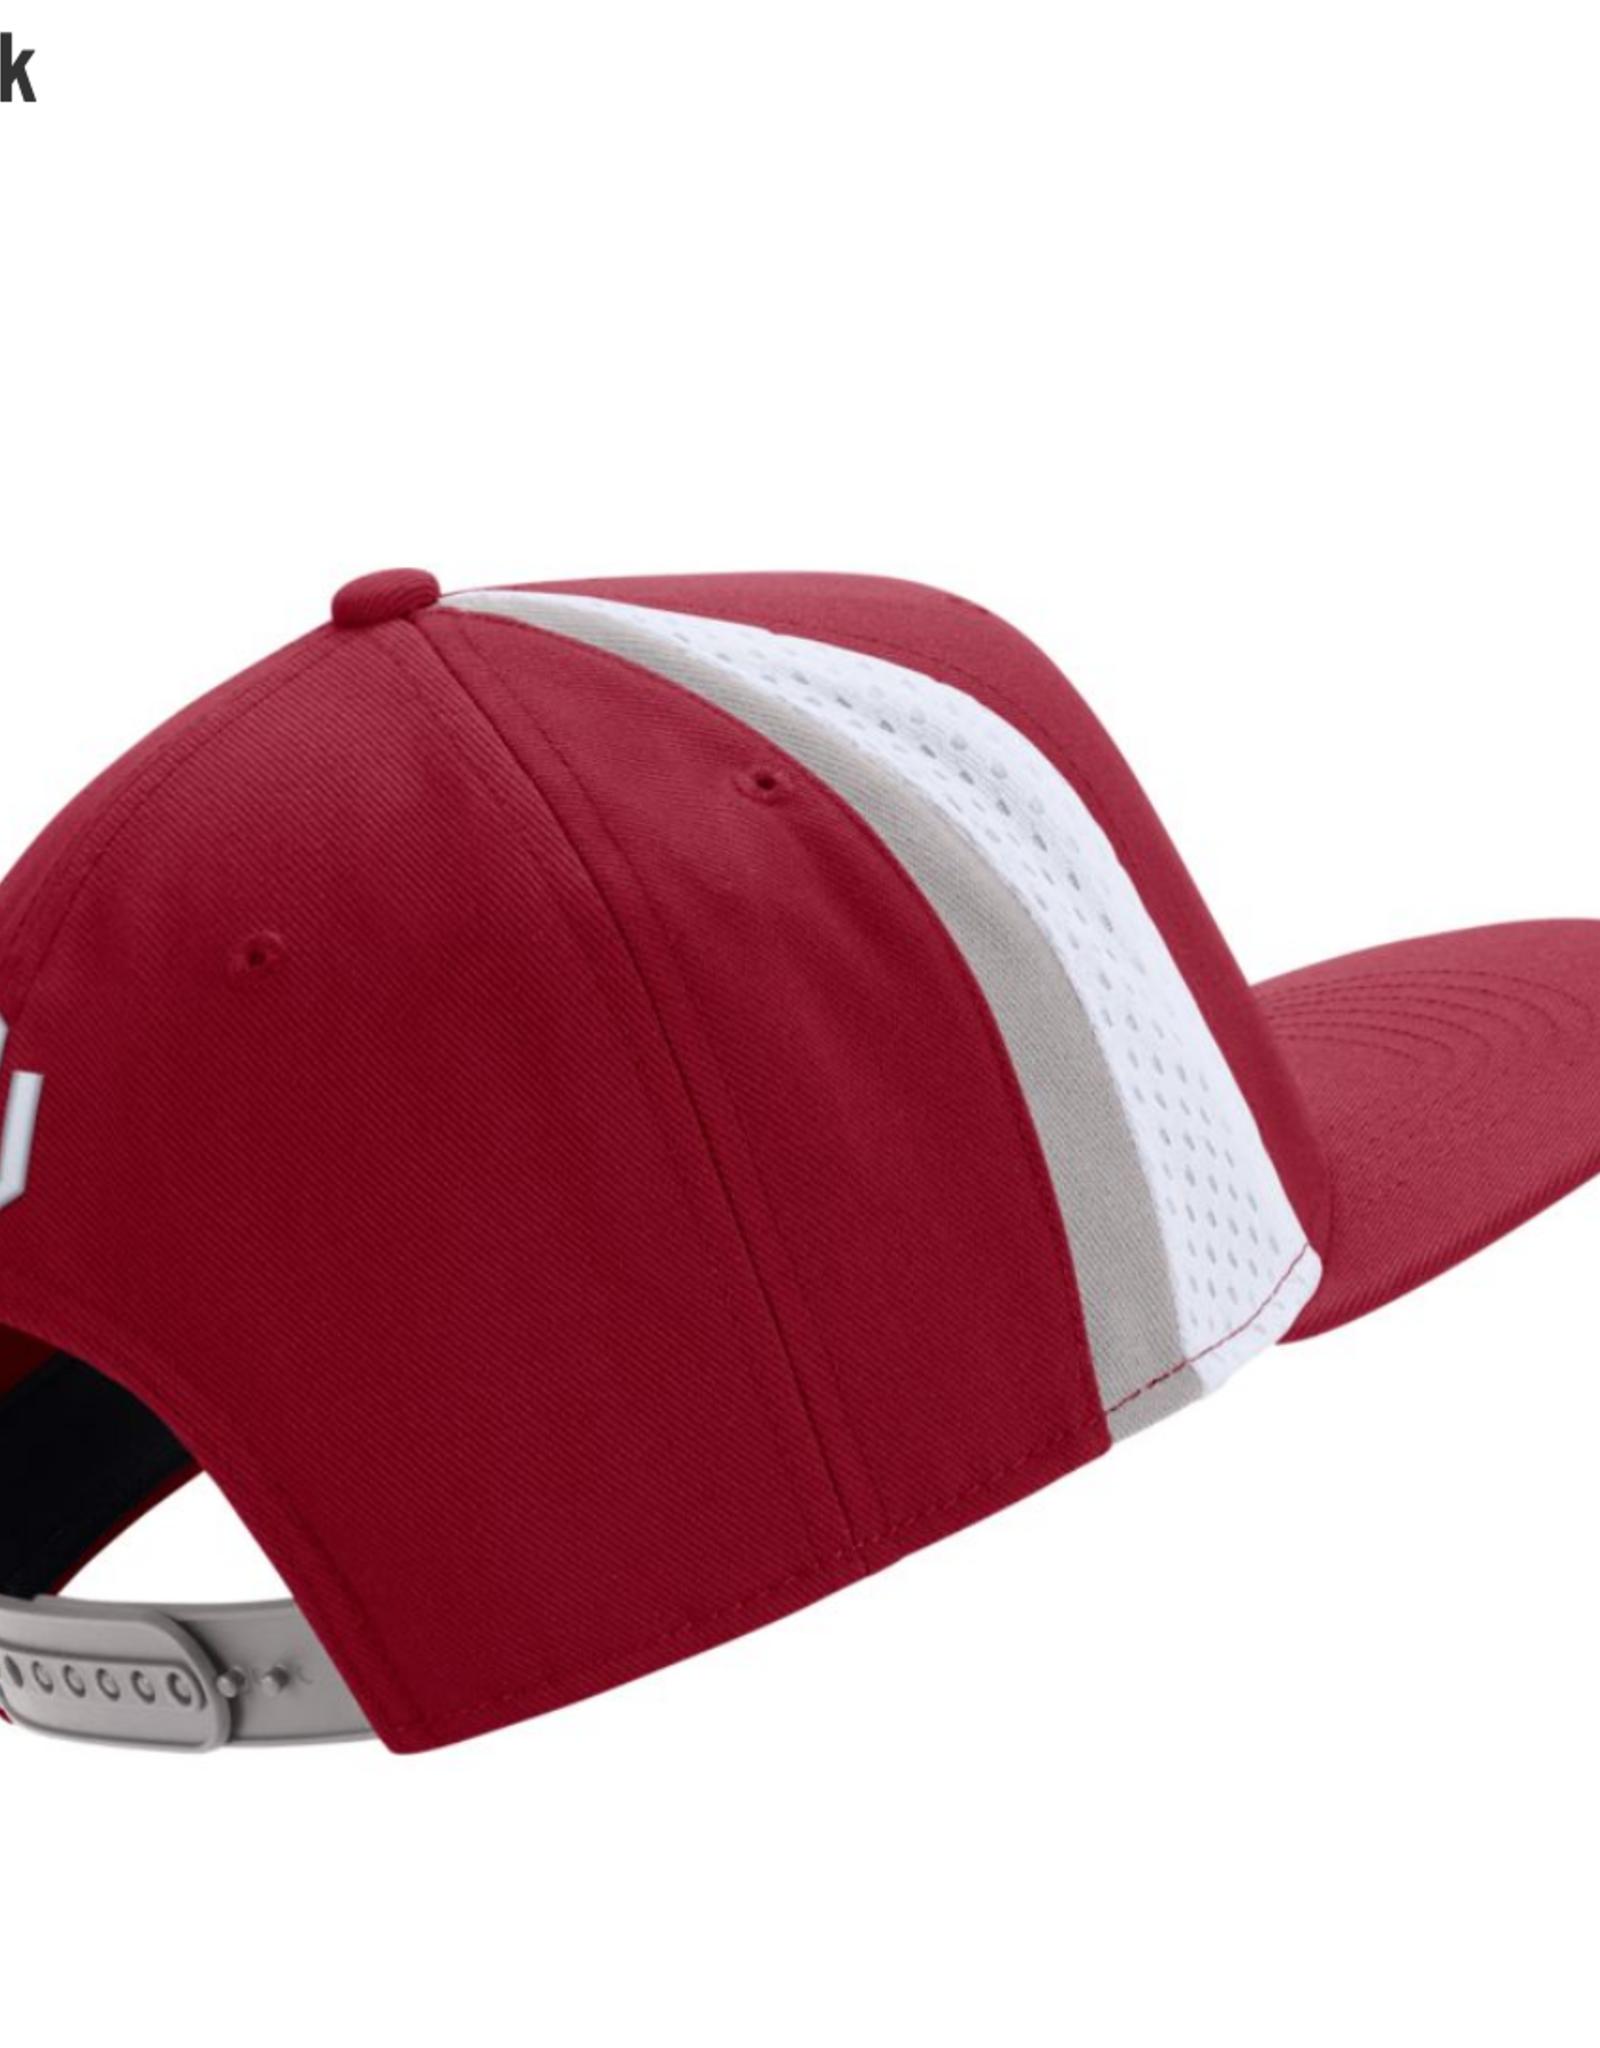 Jordan Men's Jordan Brand Nike Pro Flat Bill, Snap Back Adjustable